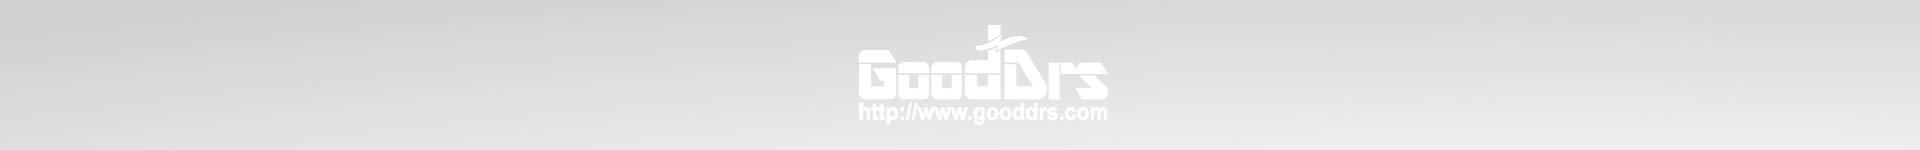 gooddrs-header